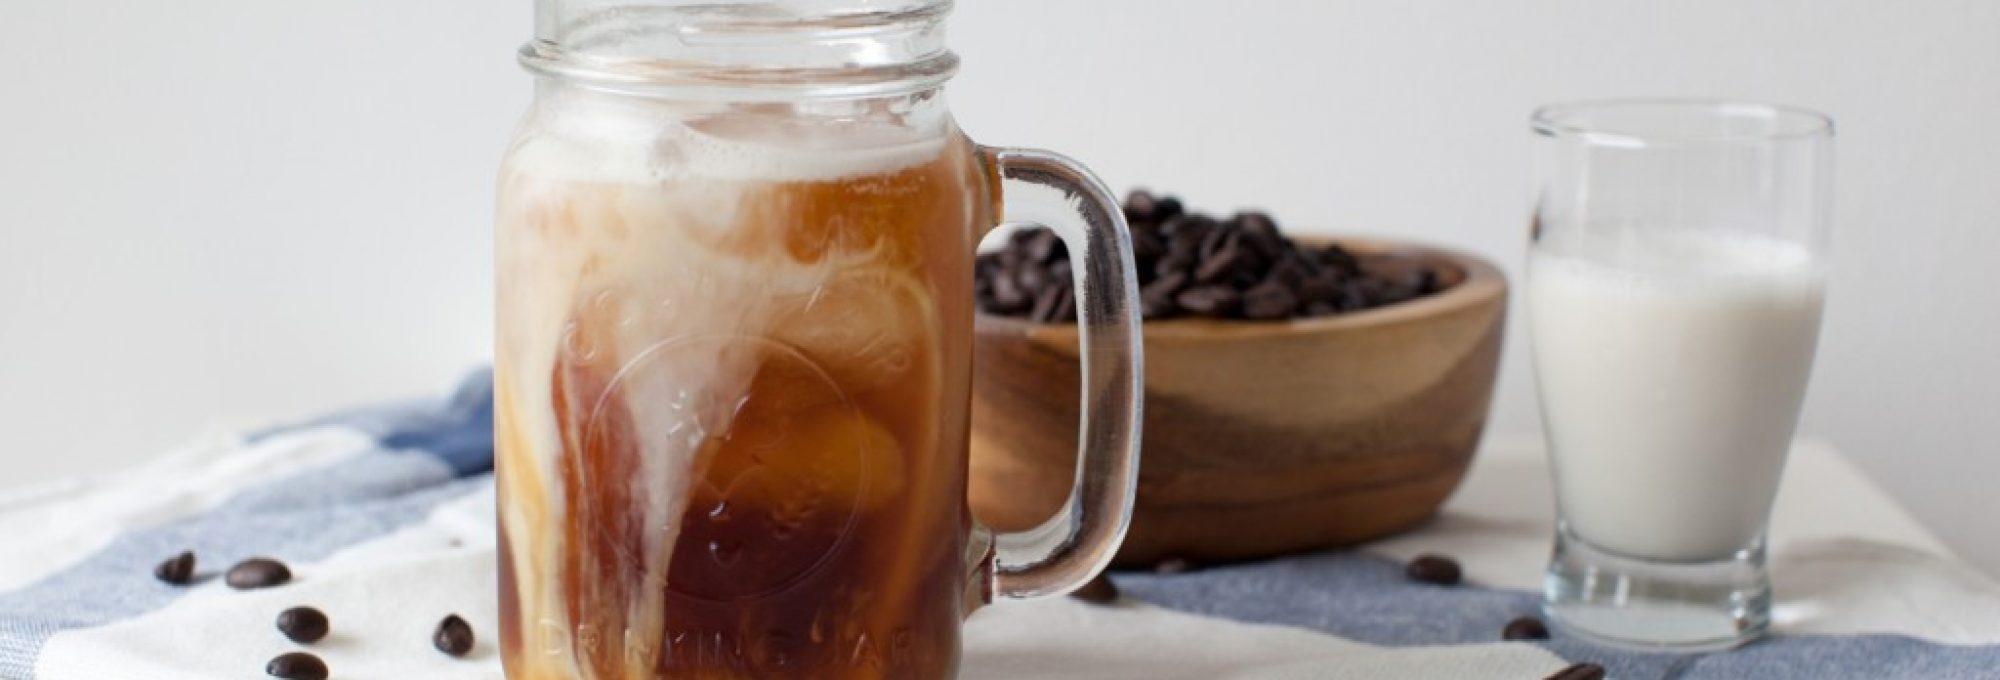 cold brew coffee recipe, iced coffee